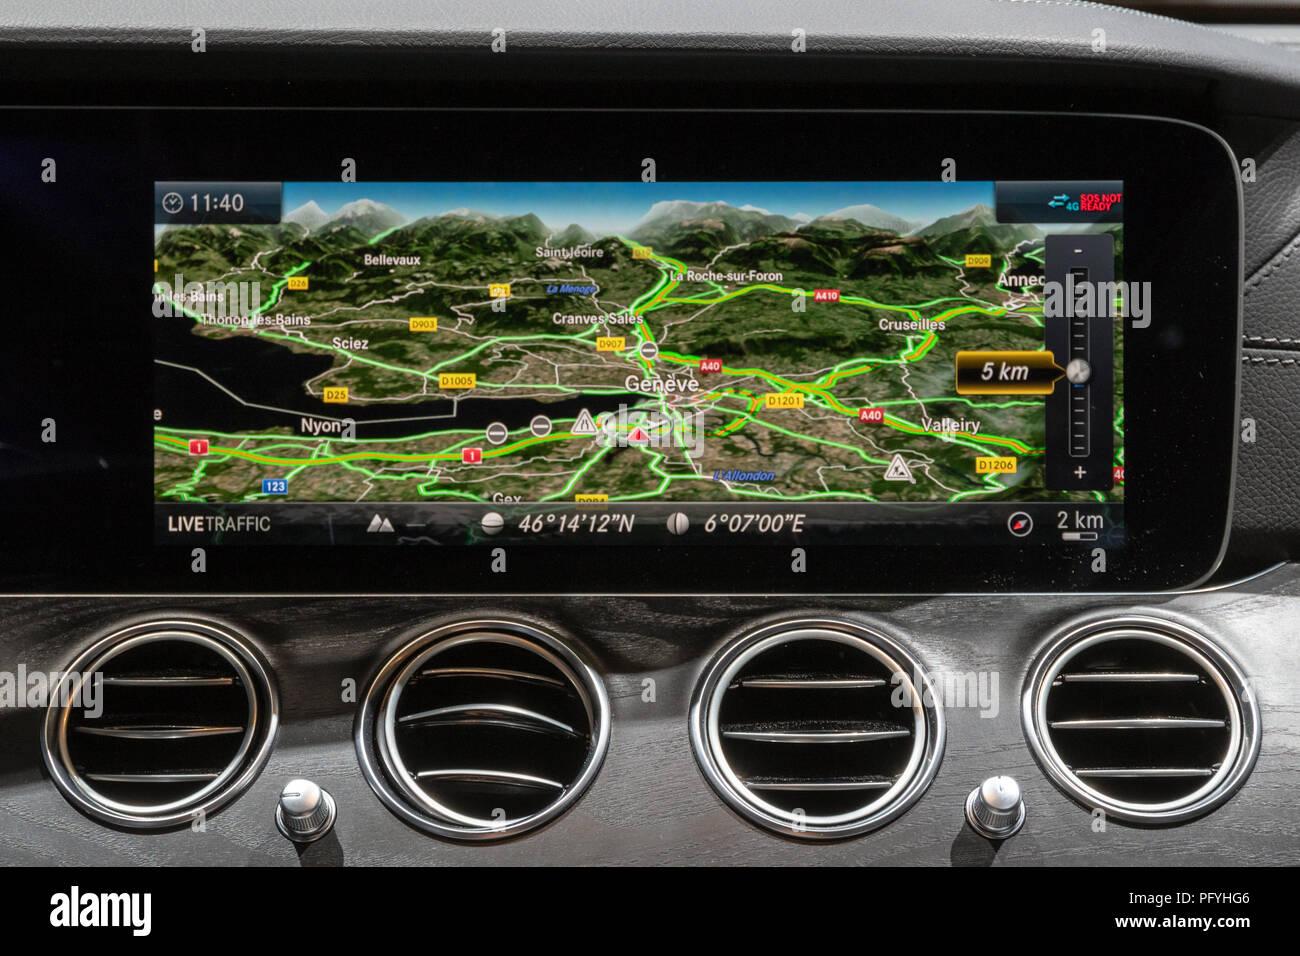 GENEVA, SWITZERLAND - MARCH 7, 2018: Interior dashboard naviagation display in the new Mercedes Benz E300 Diesel Hybrid car at the 88th Geneva Interna - Stock Image